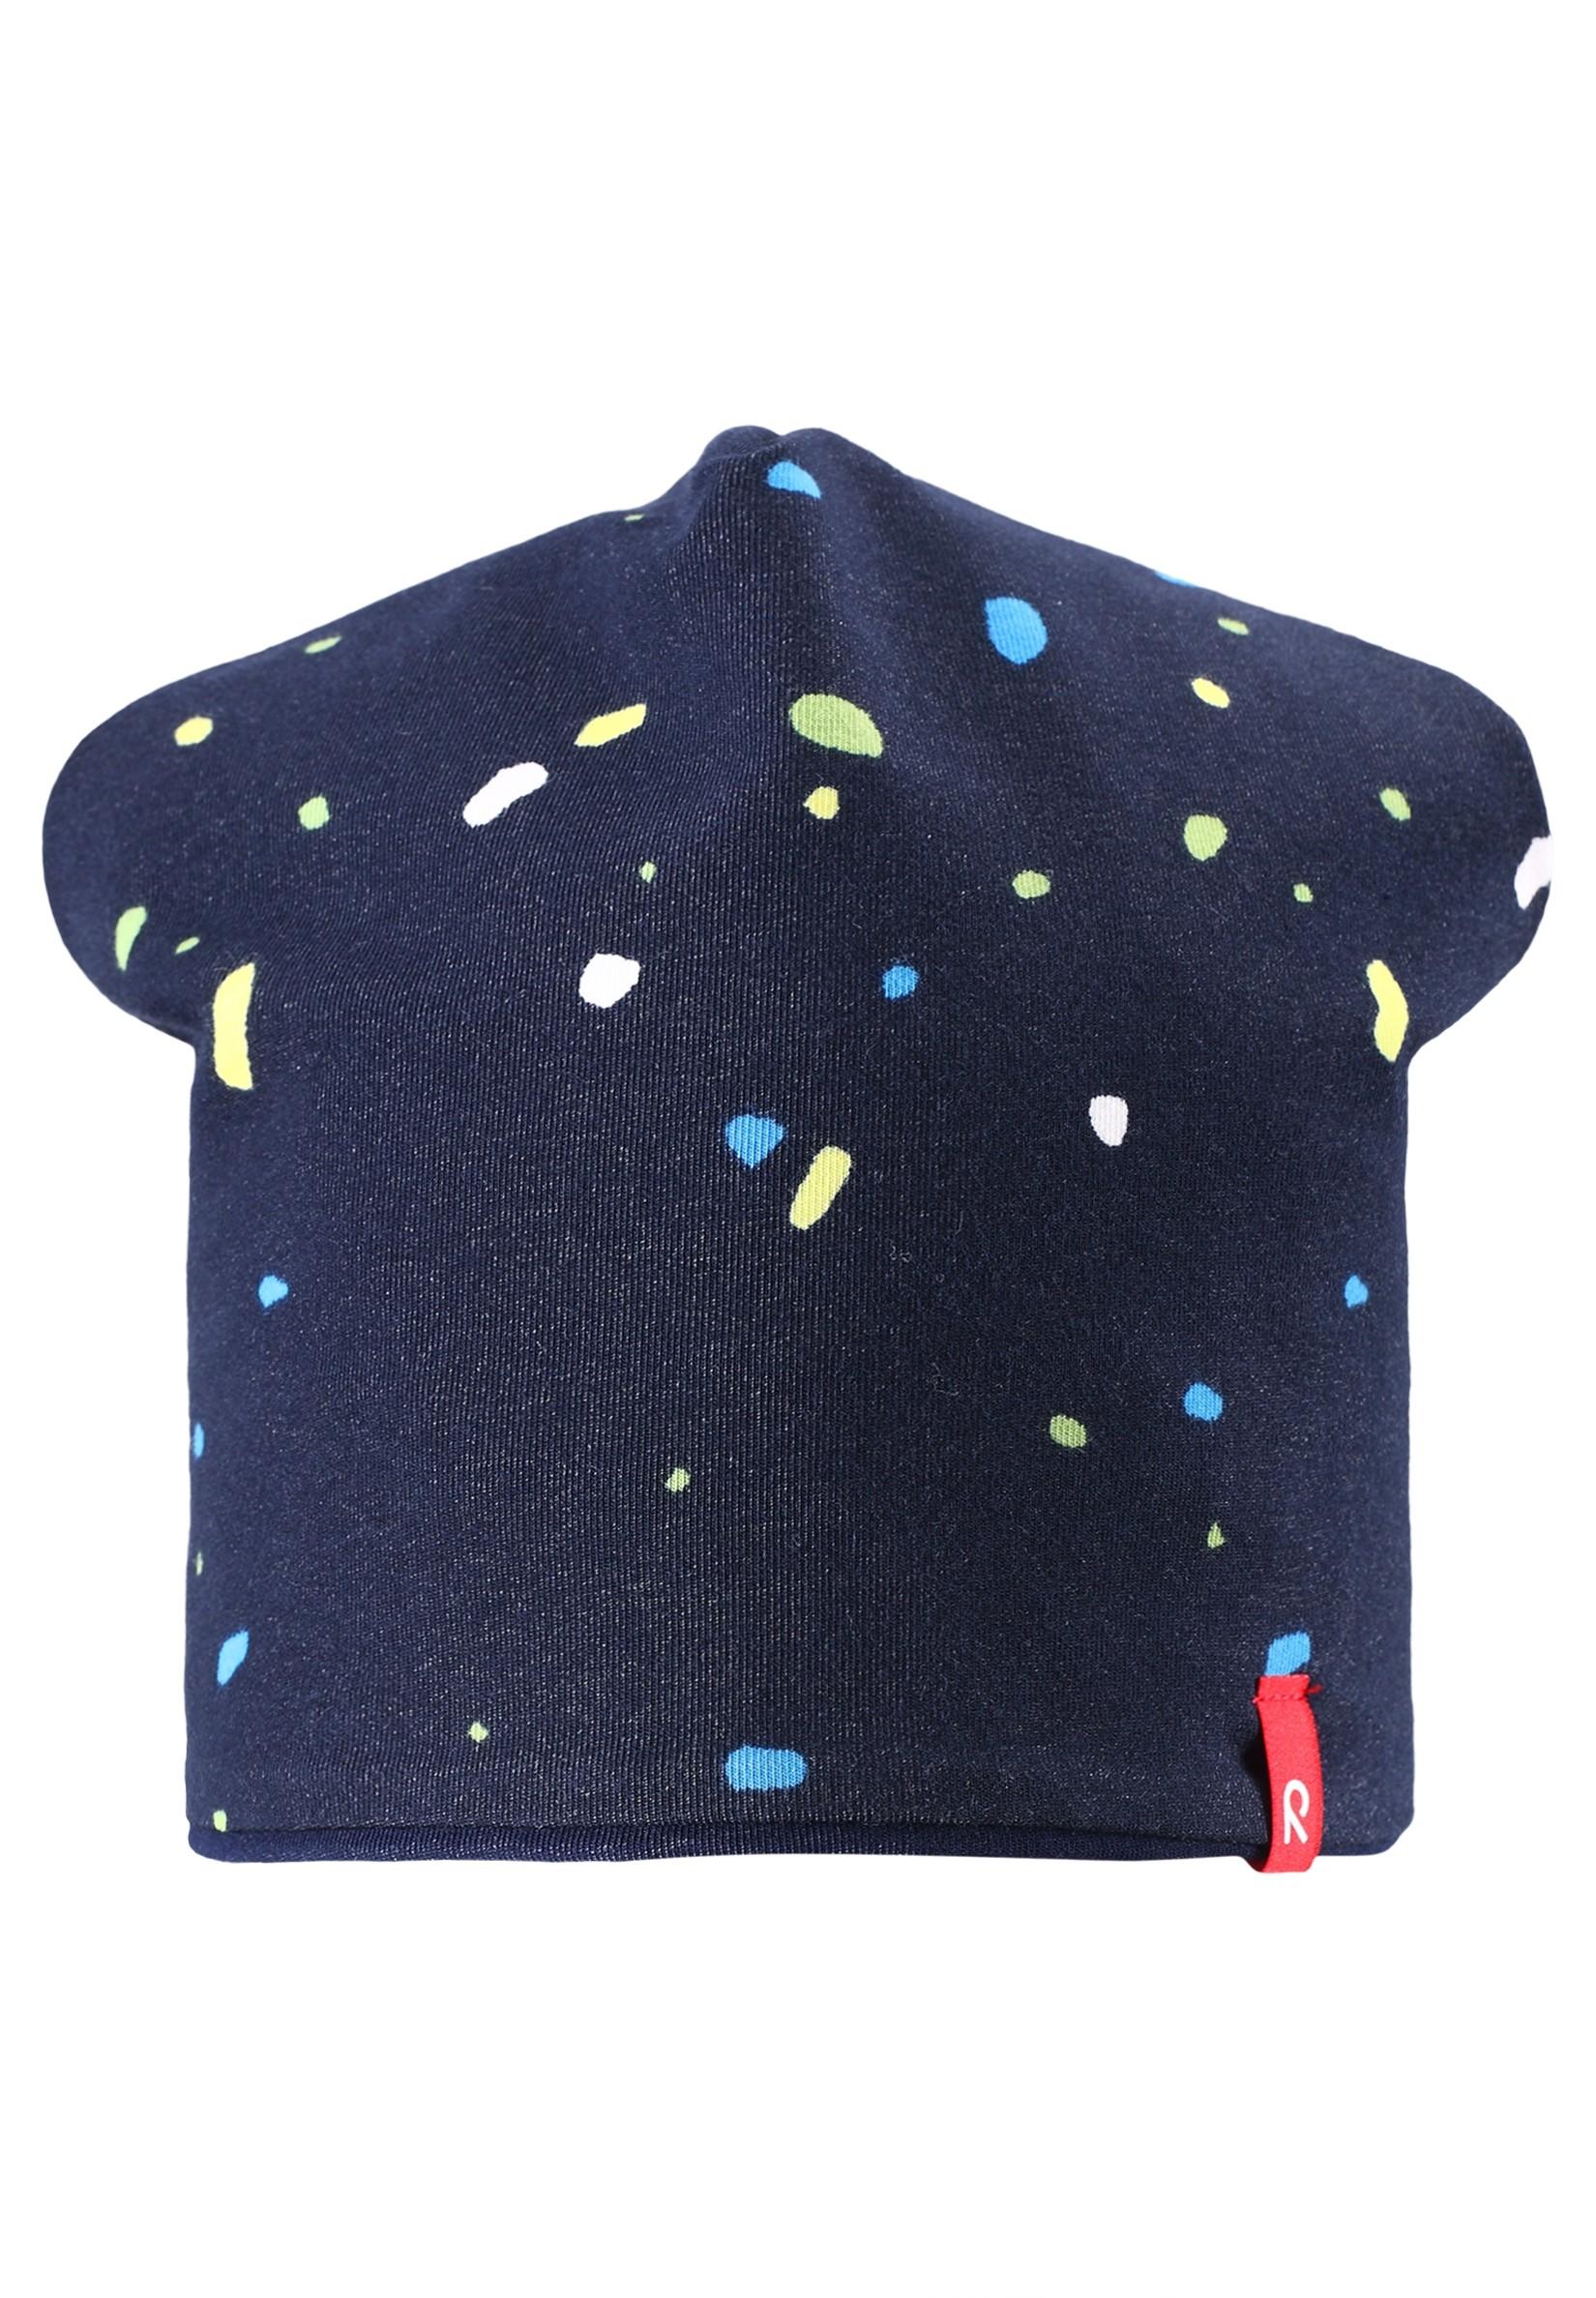 Головные уборы Reima Шапка Beanie, Frappe navy, синяя шапка obey ruger beanie brown